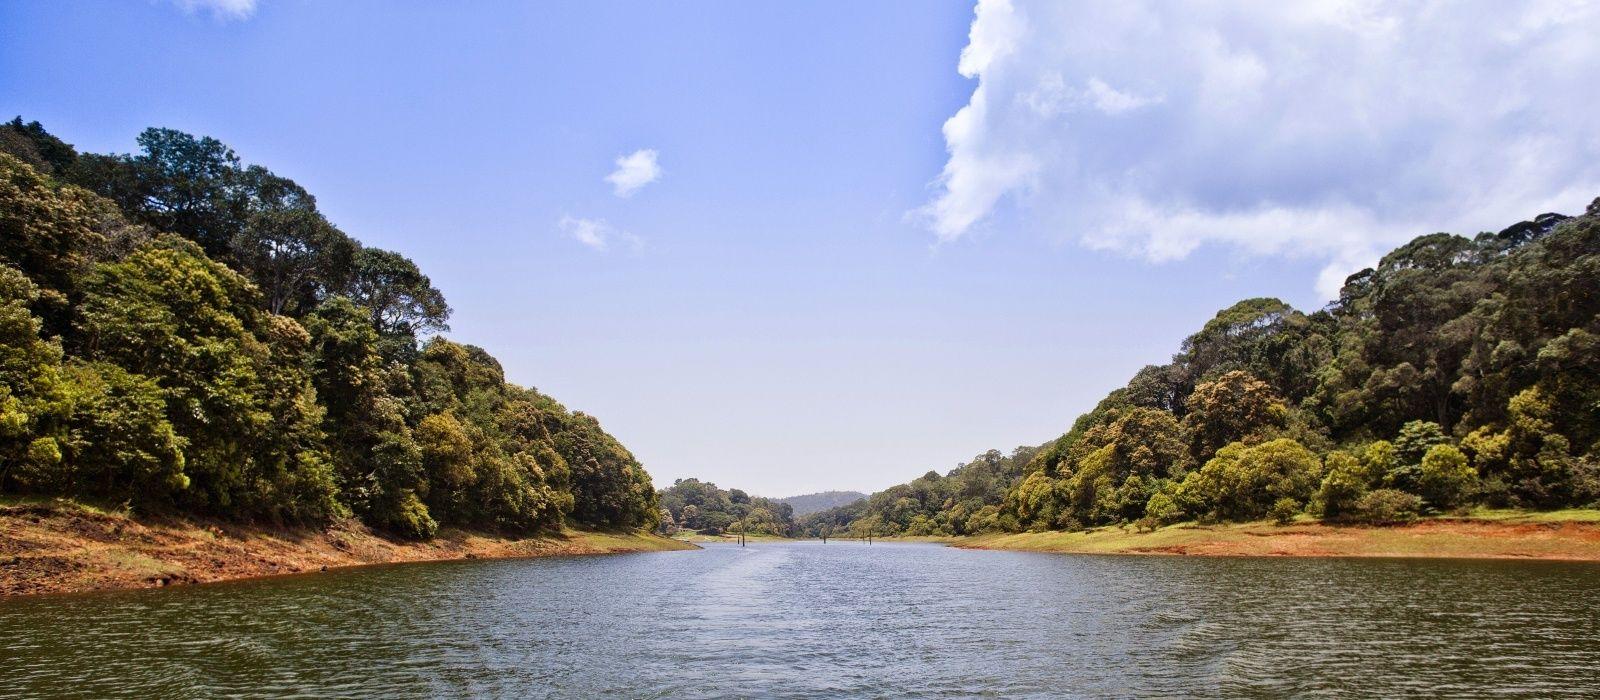 Los canales de Kerala Tour Trip 3